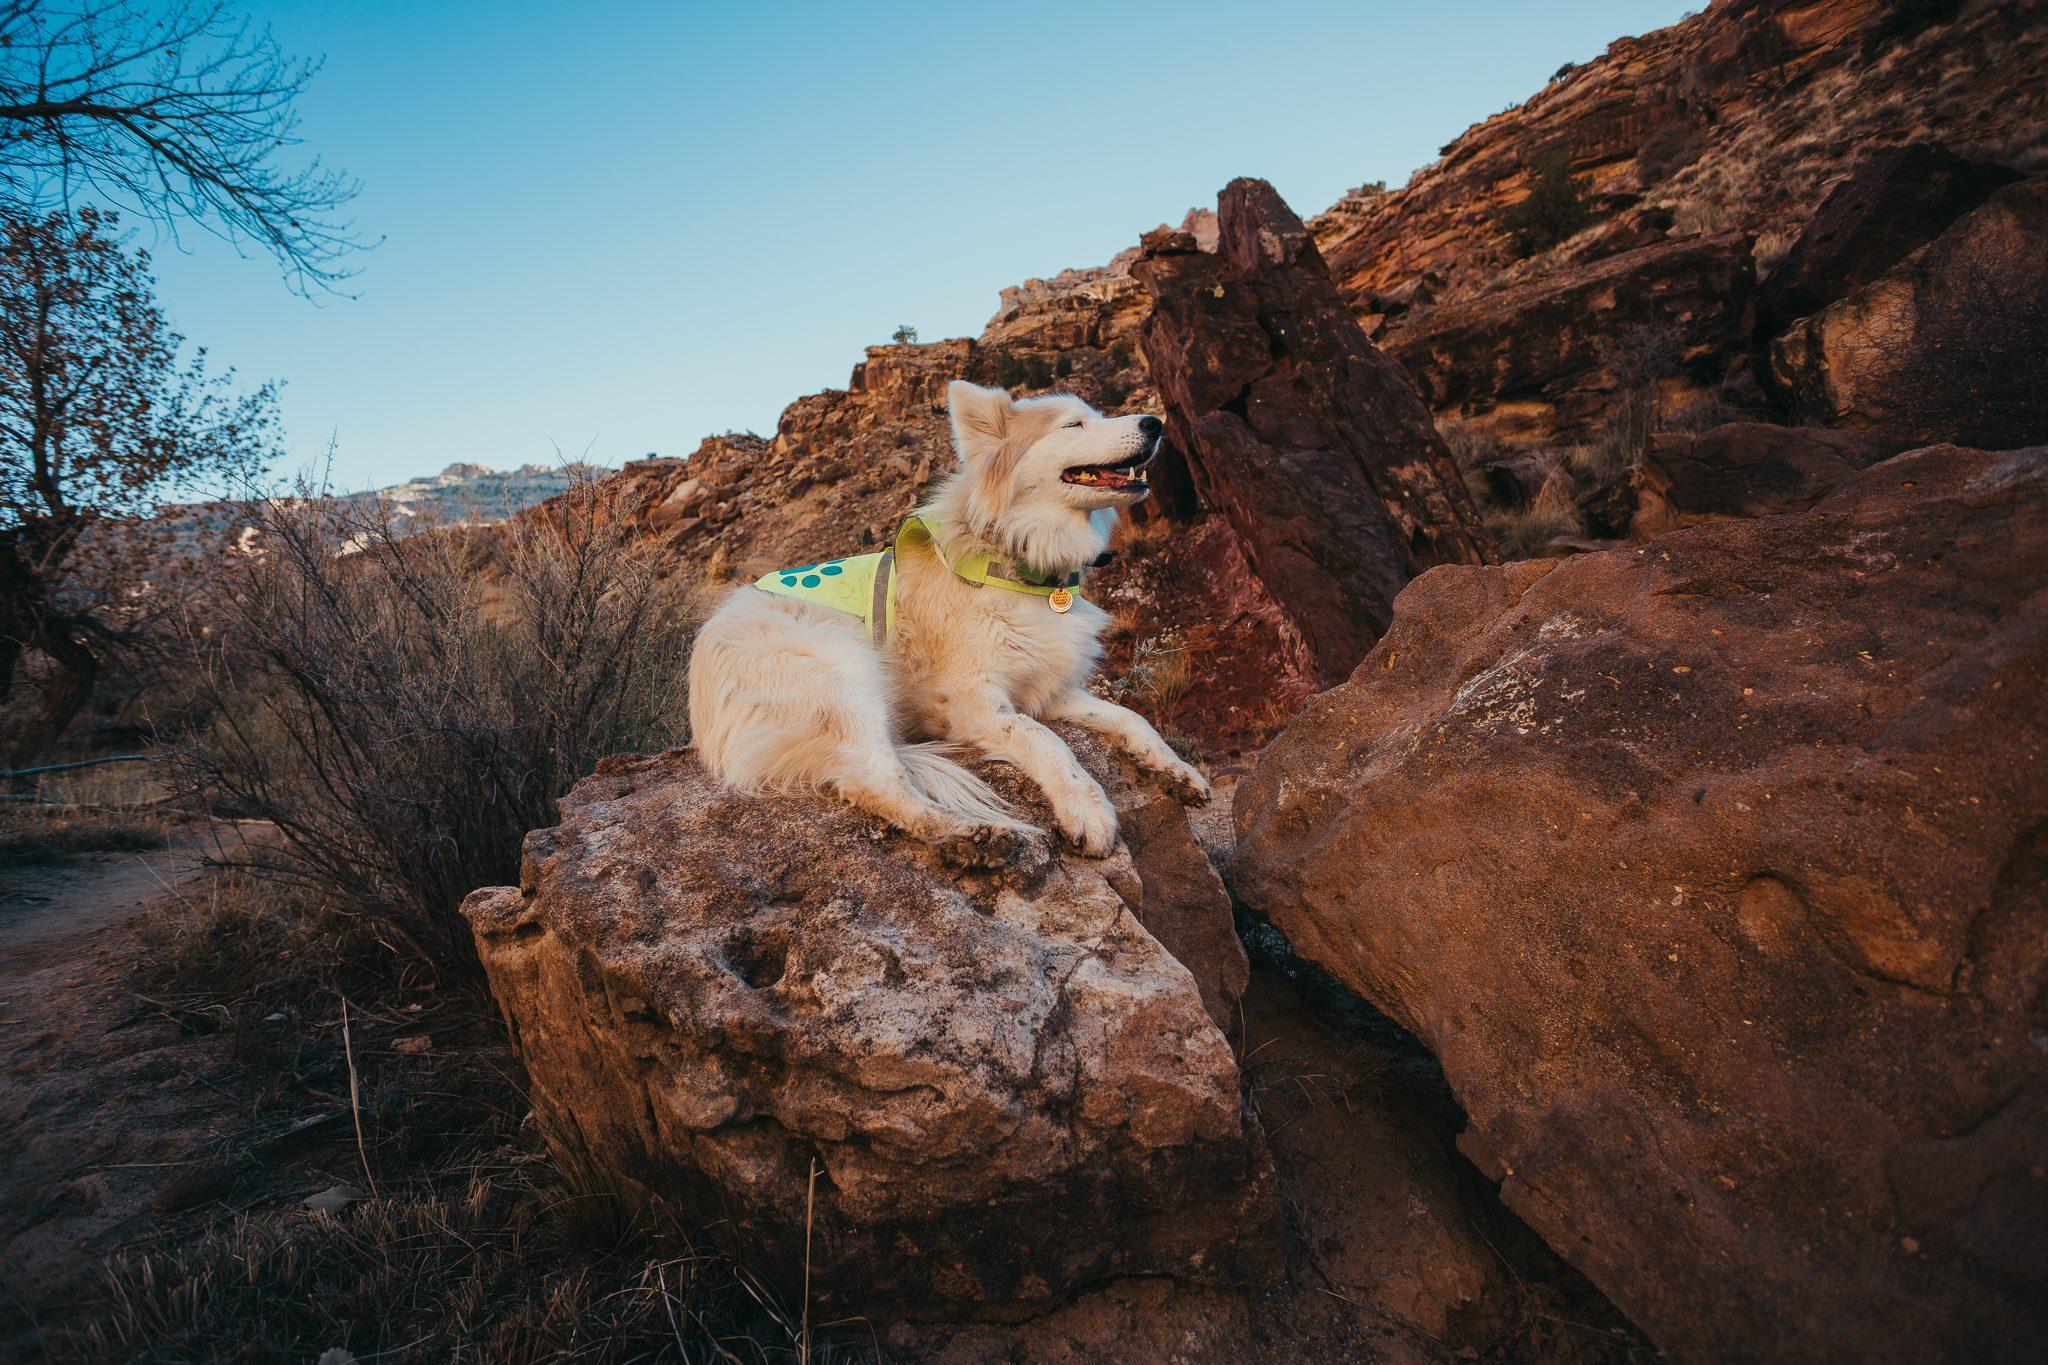 Stella taking a break after hiking… 20 ft